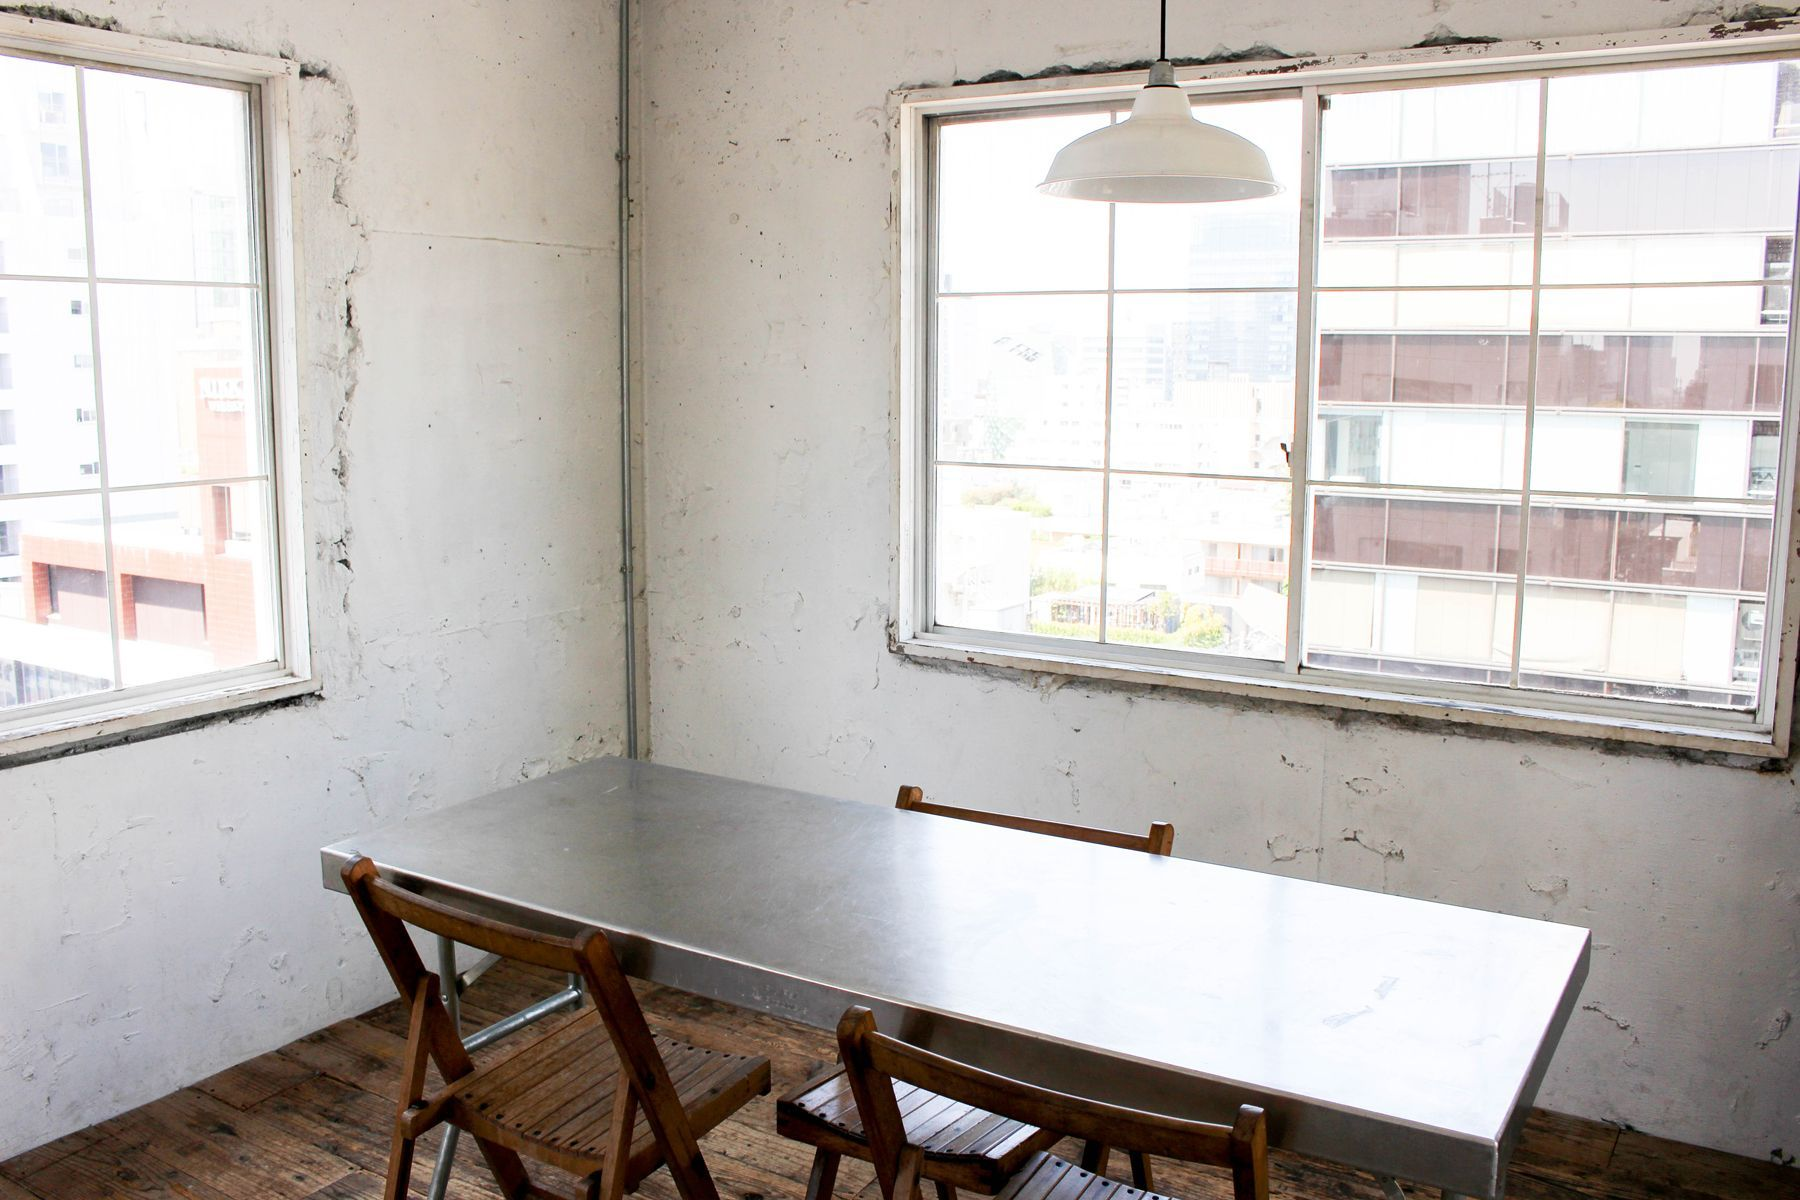 atelier rauque Astudio (アトリエ ローク)